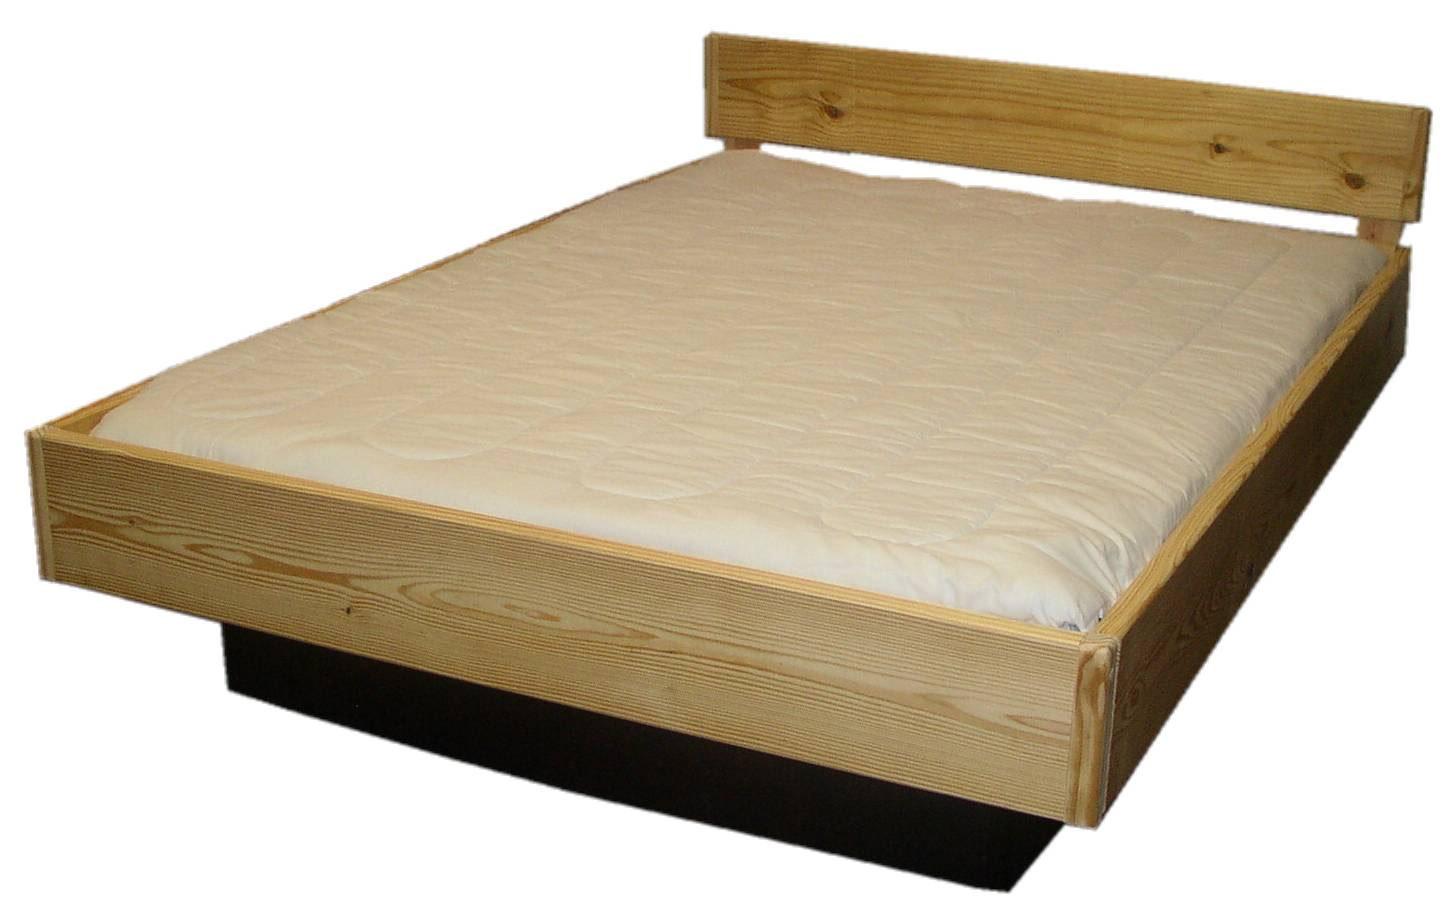 Hardside waterbed mattress. Waterbed heater